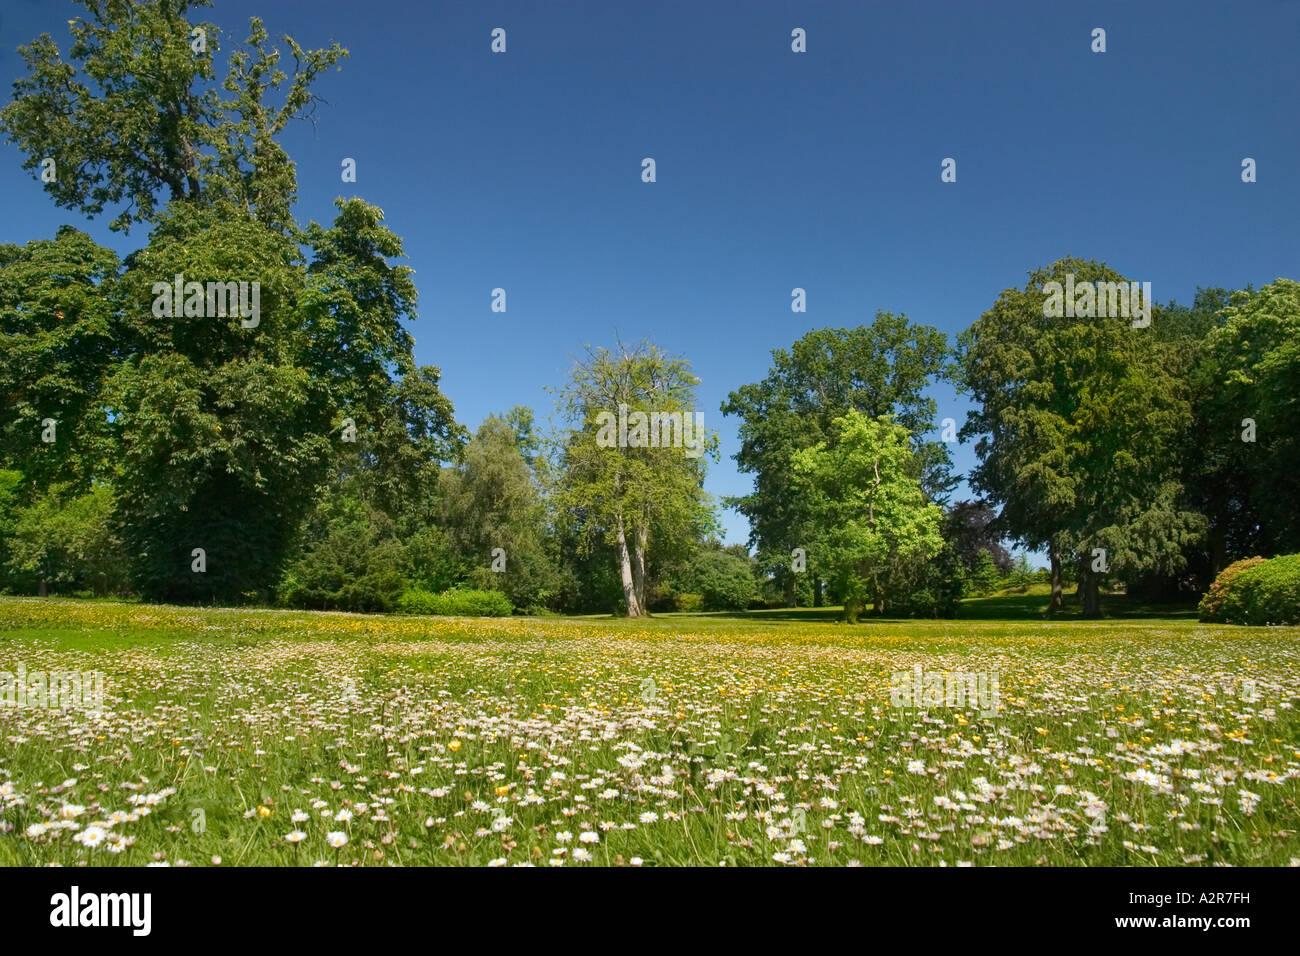 Meadow with flowers Vedbygård Zealand Denmark - Stock Image